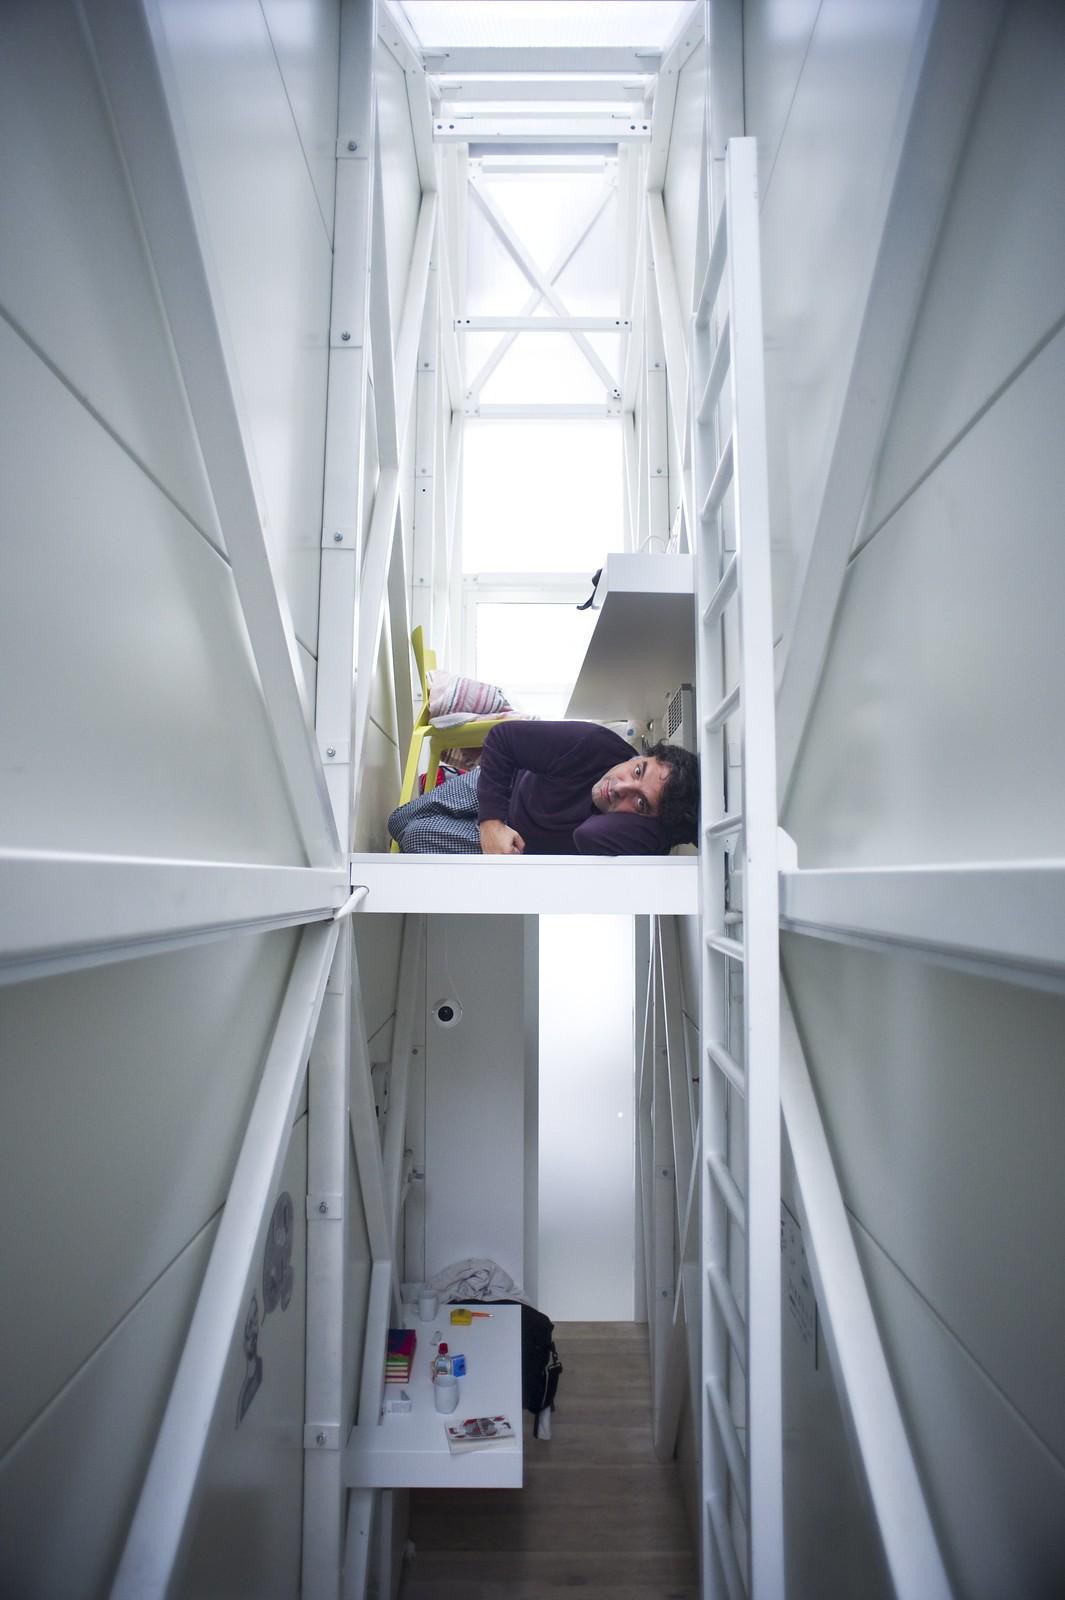 Jakub Szczesny - Inside The Keret House 世界最瘦屋 - Photo 22